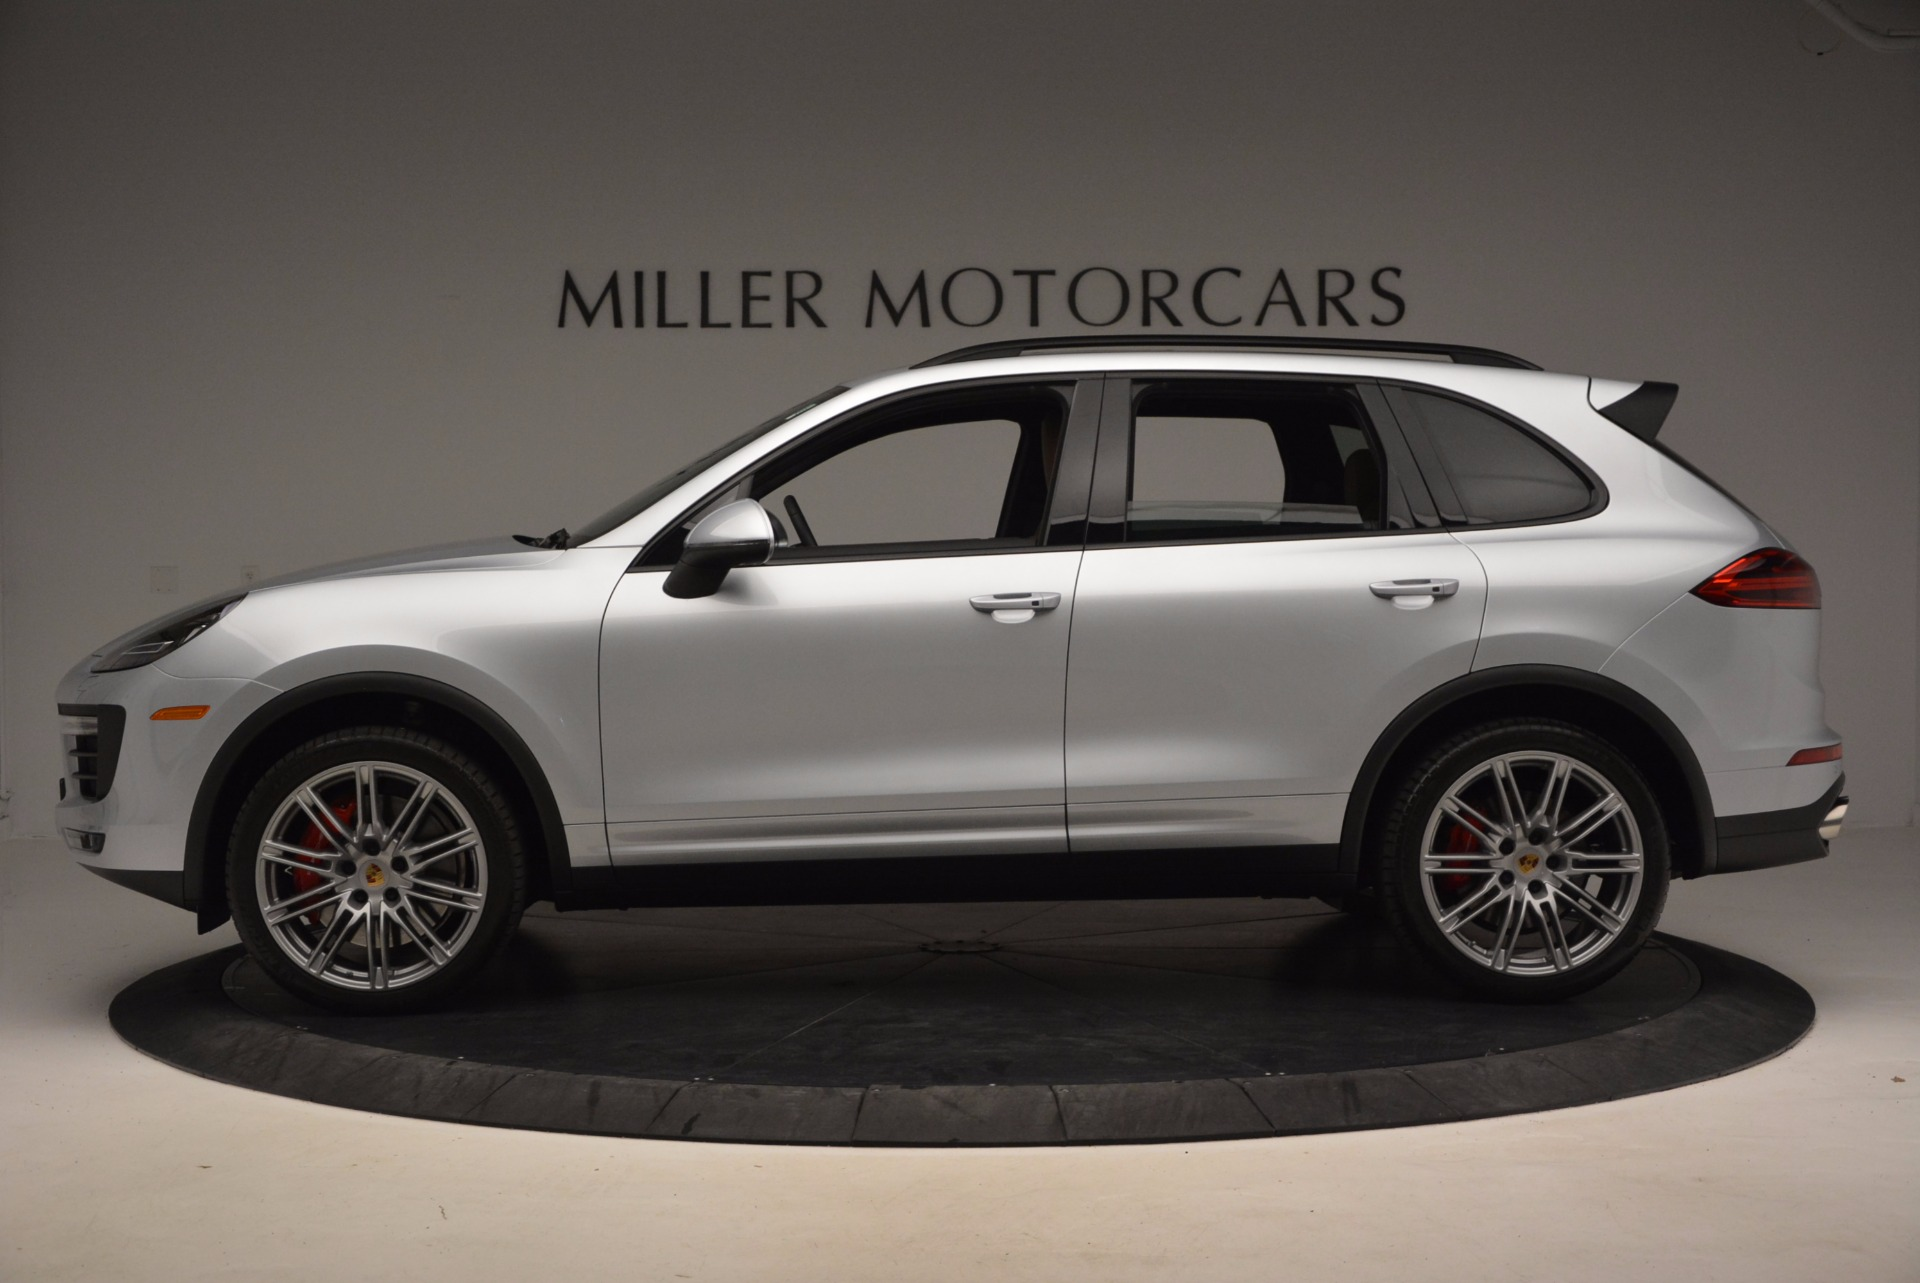 Toyota Westport Ct >> Porsche New Used Dealer Connecticut Ct Porsche Of | Autos Post